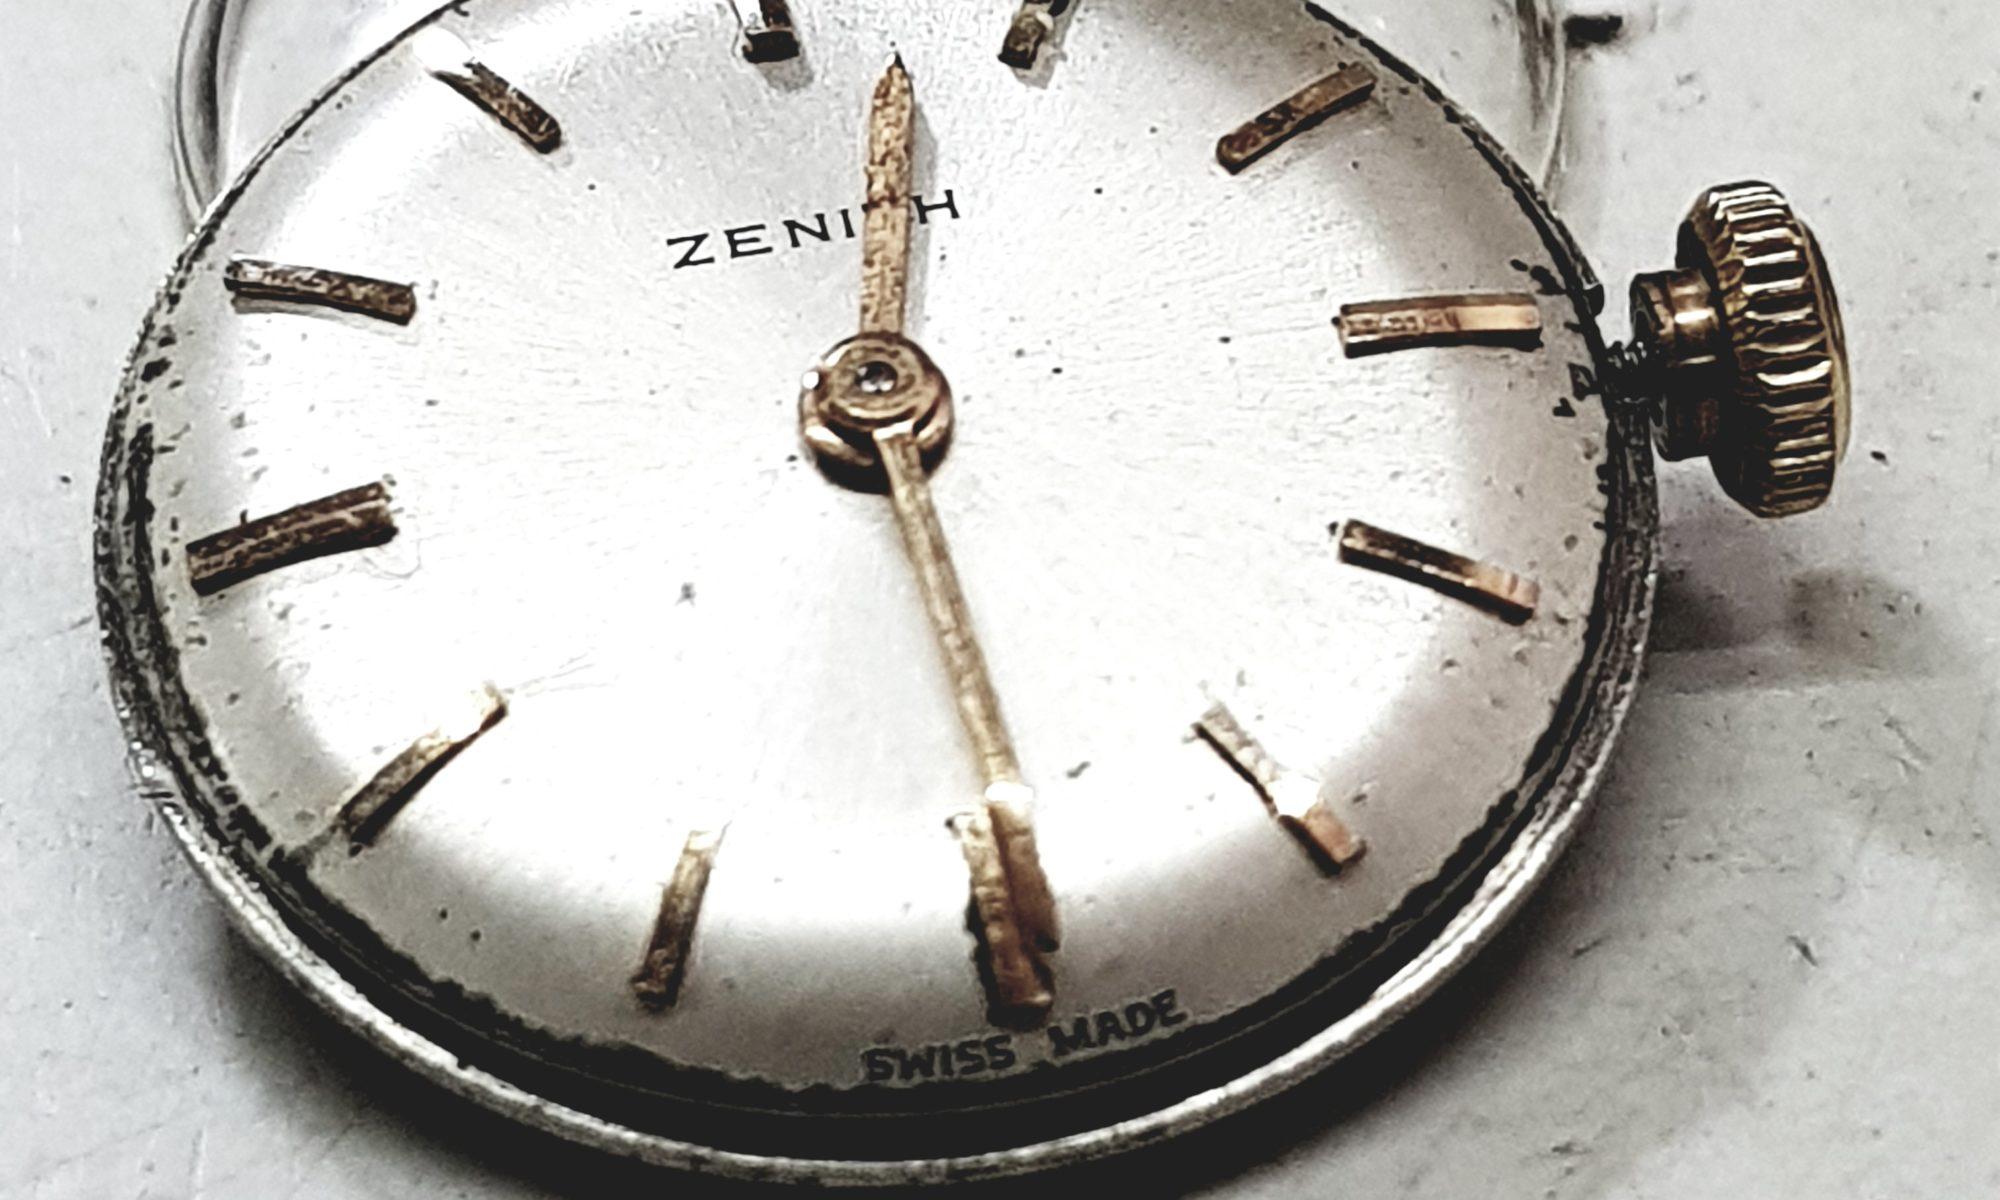 Movimento Zenith Donna